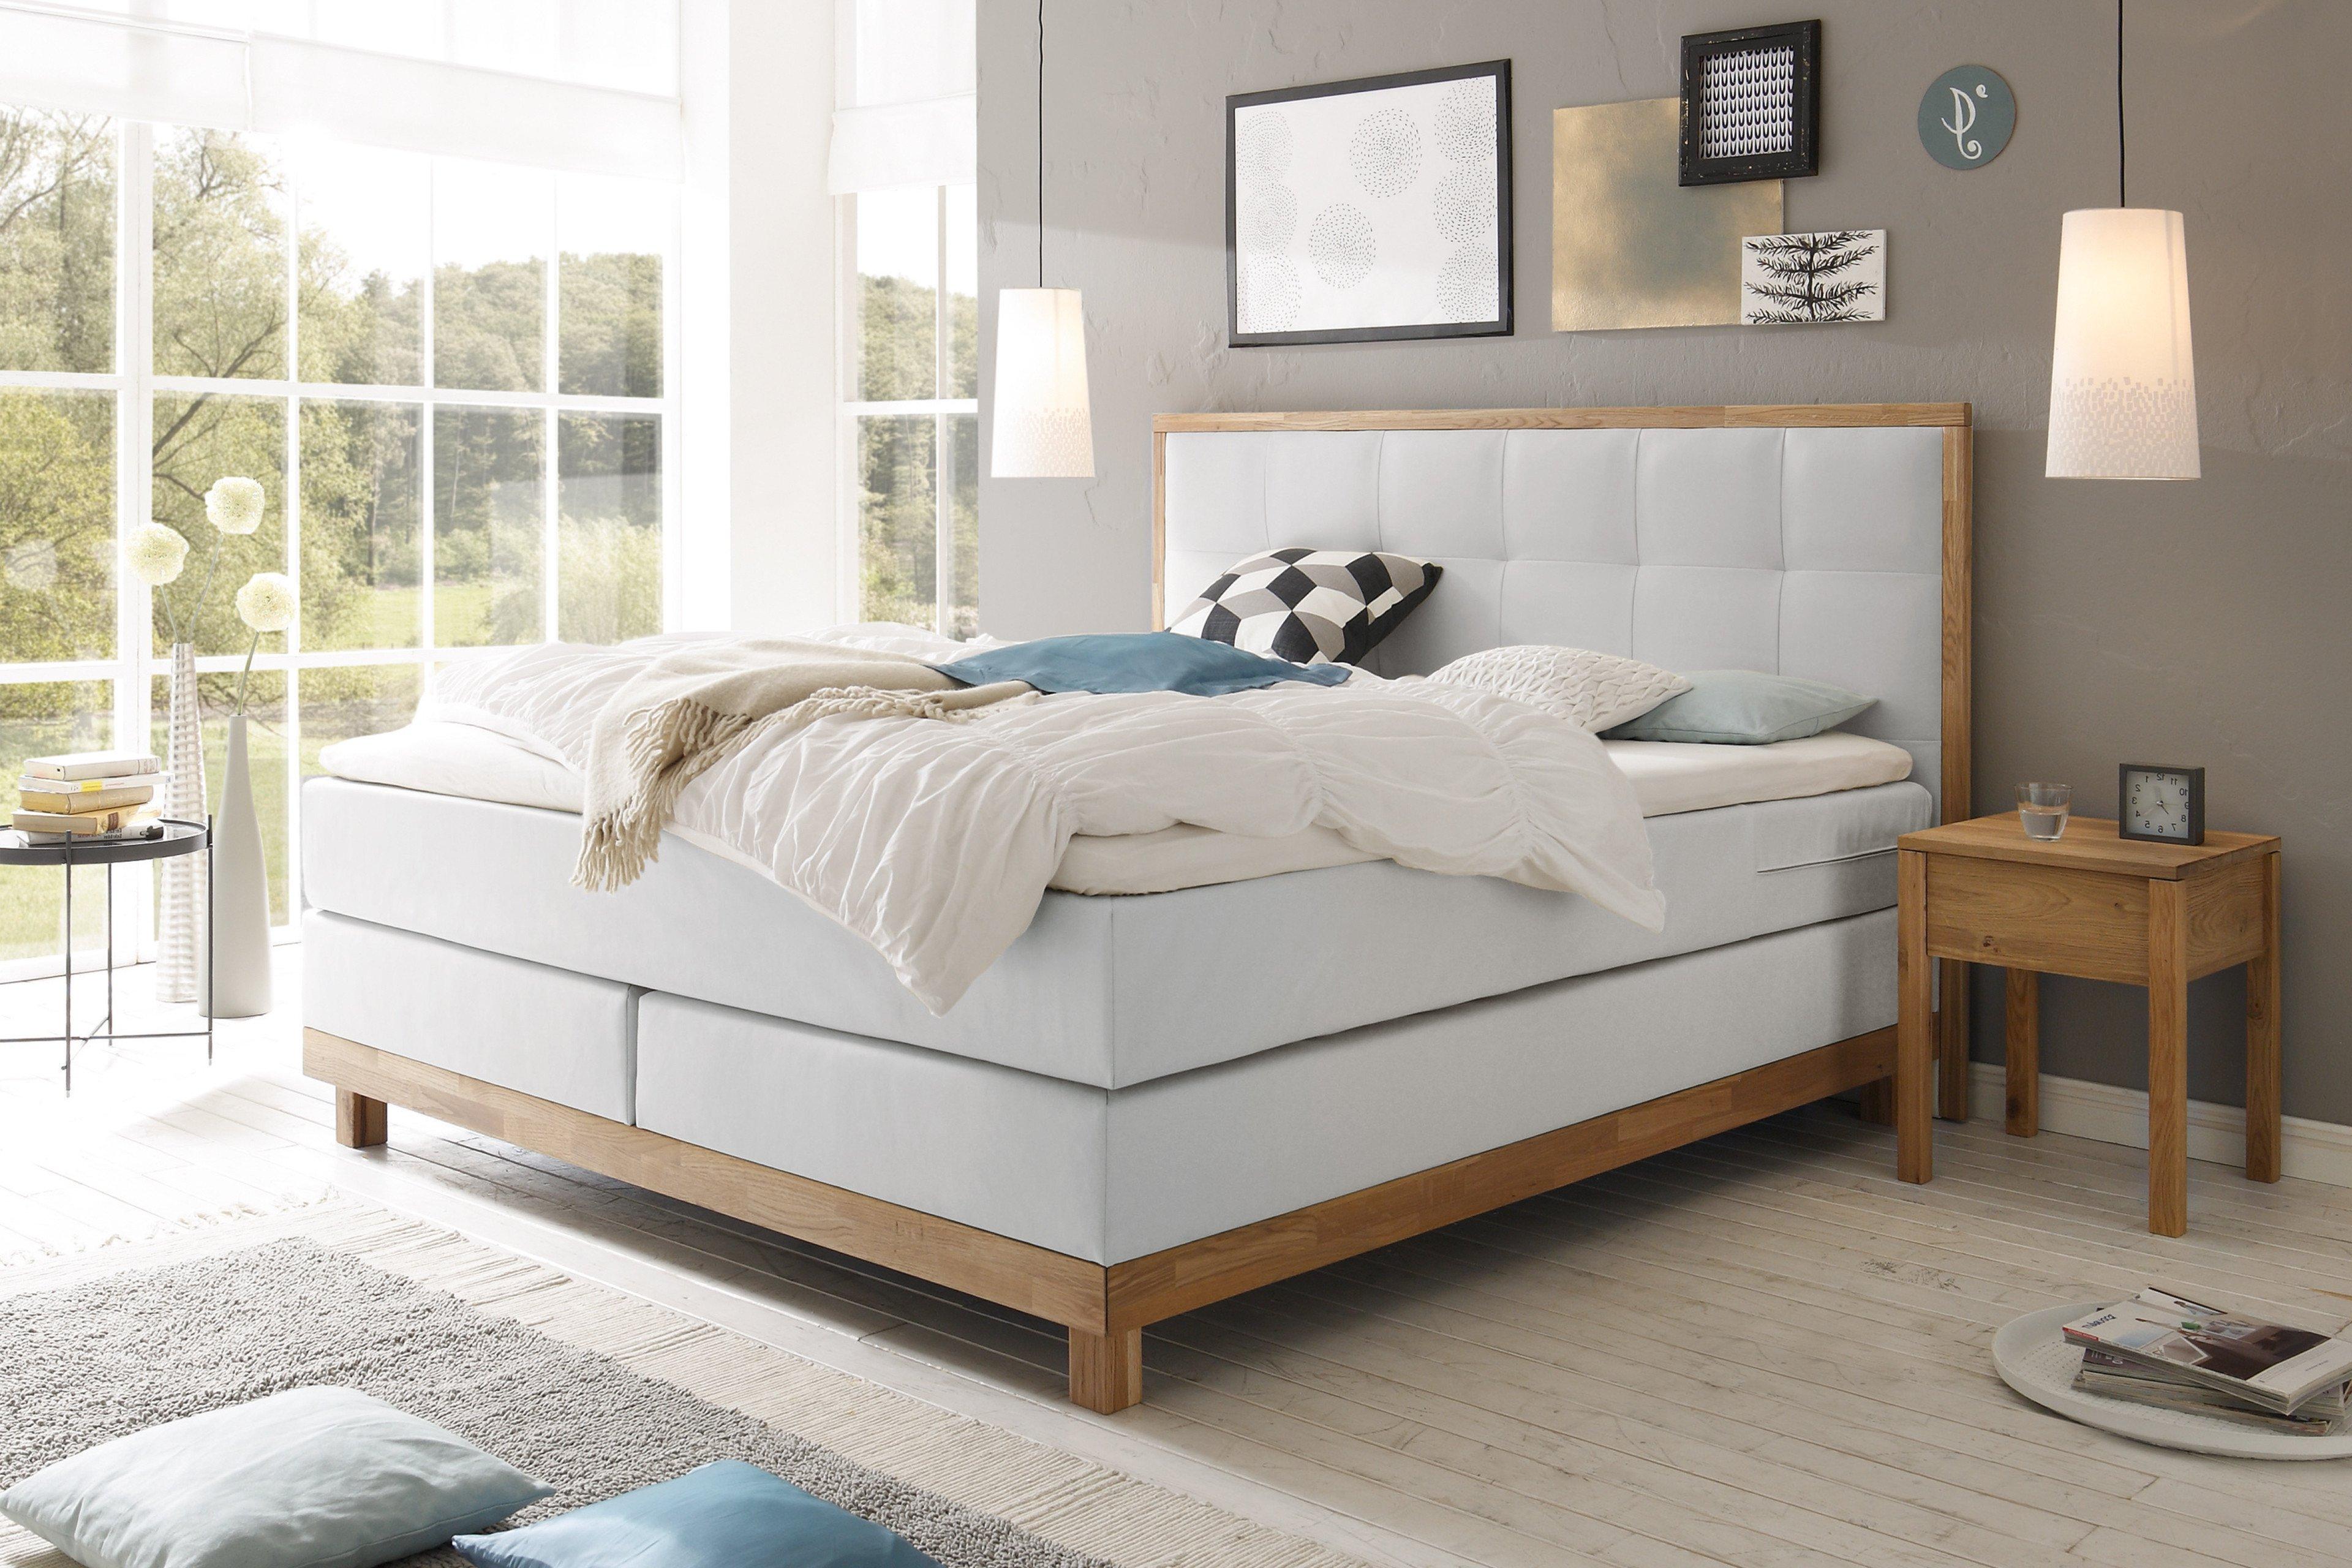 hasena pronto chalet boxspringbett beige m bel letz. Black Bedroom Furniture Sets. Home Design Ideas